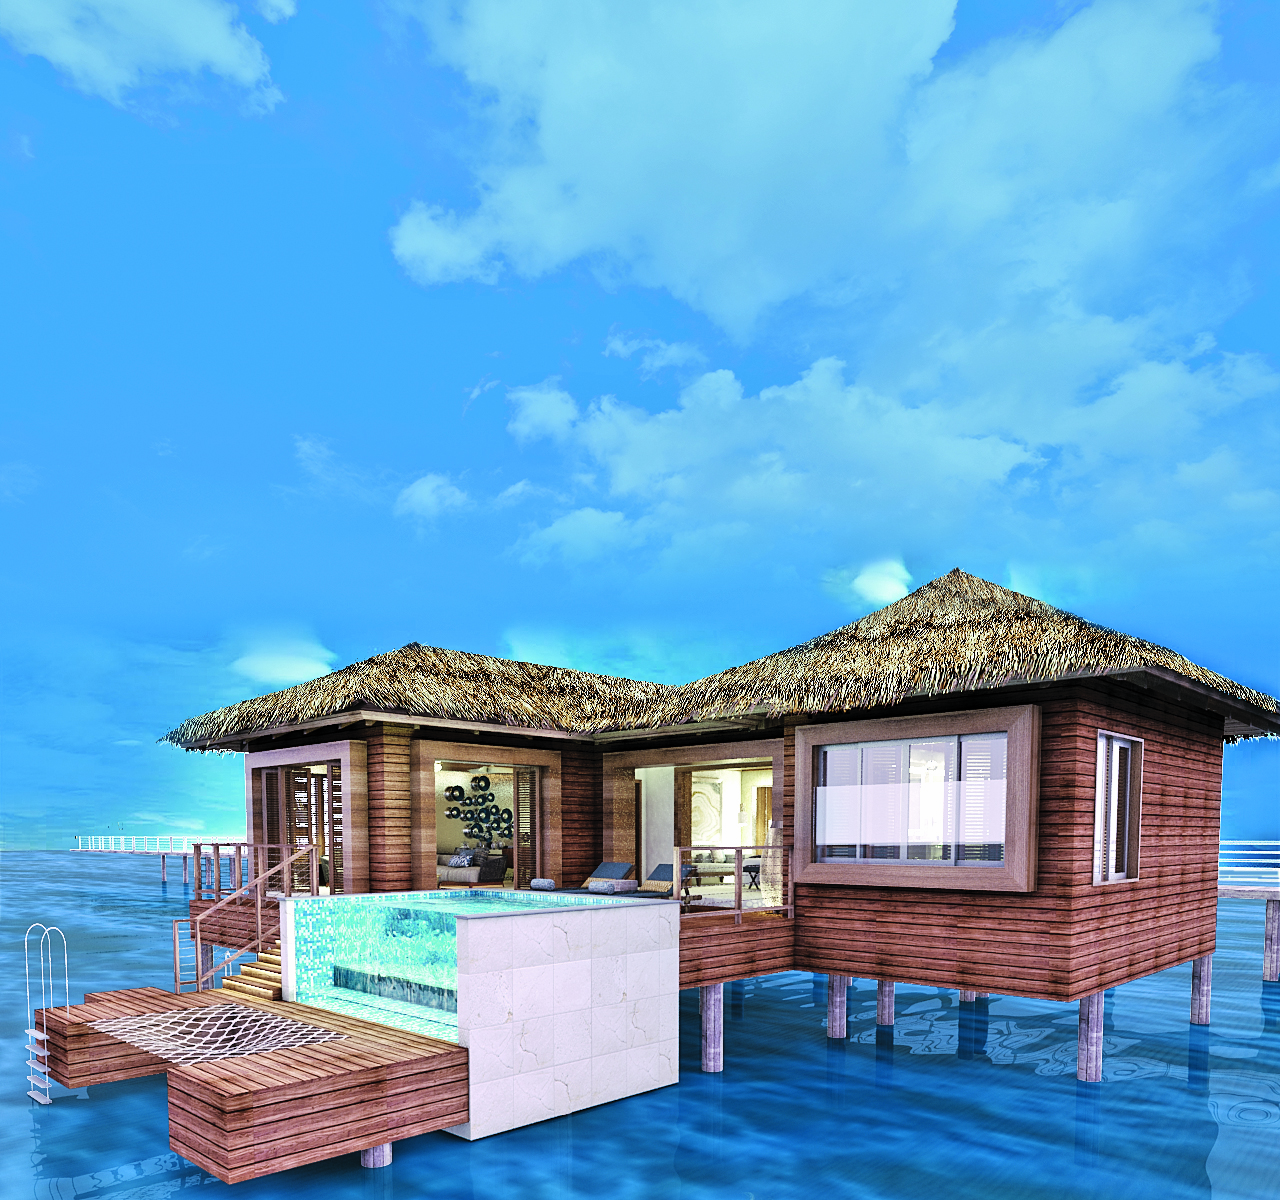 Royalton-Antigua-Caribbean-All-Inclusive-Resort-Antigua